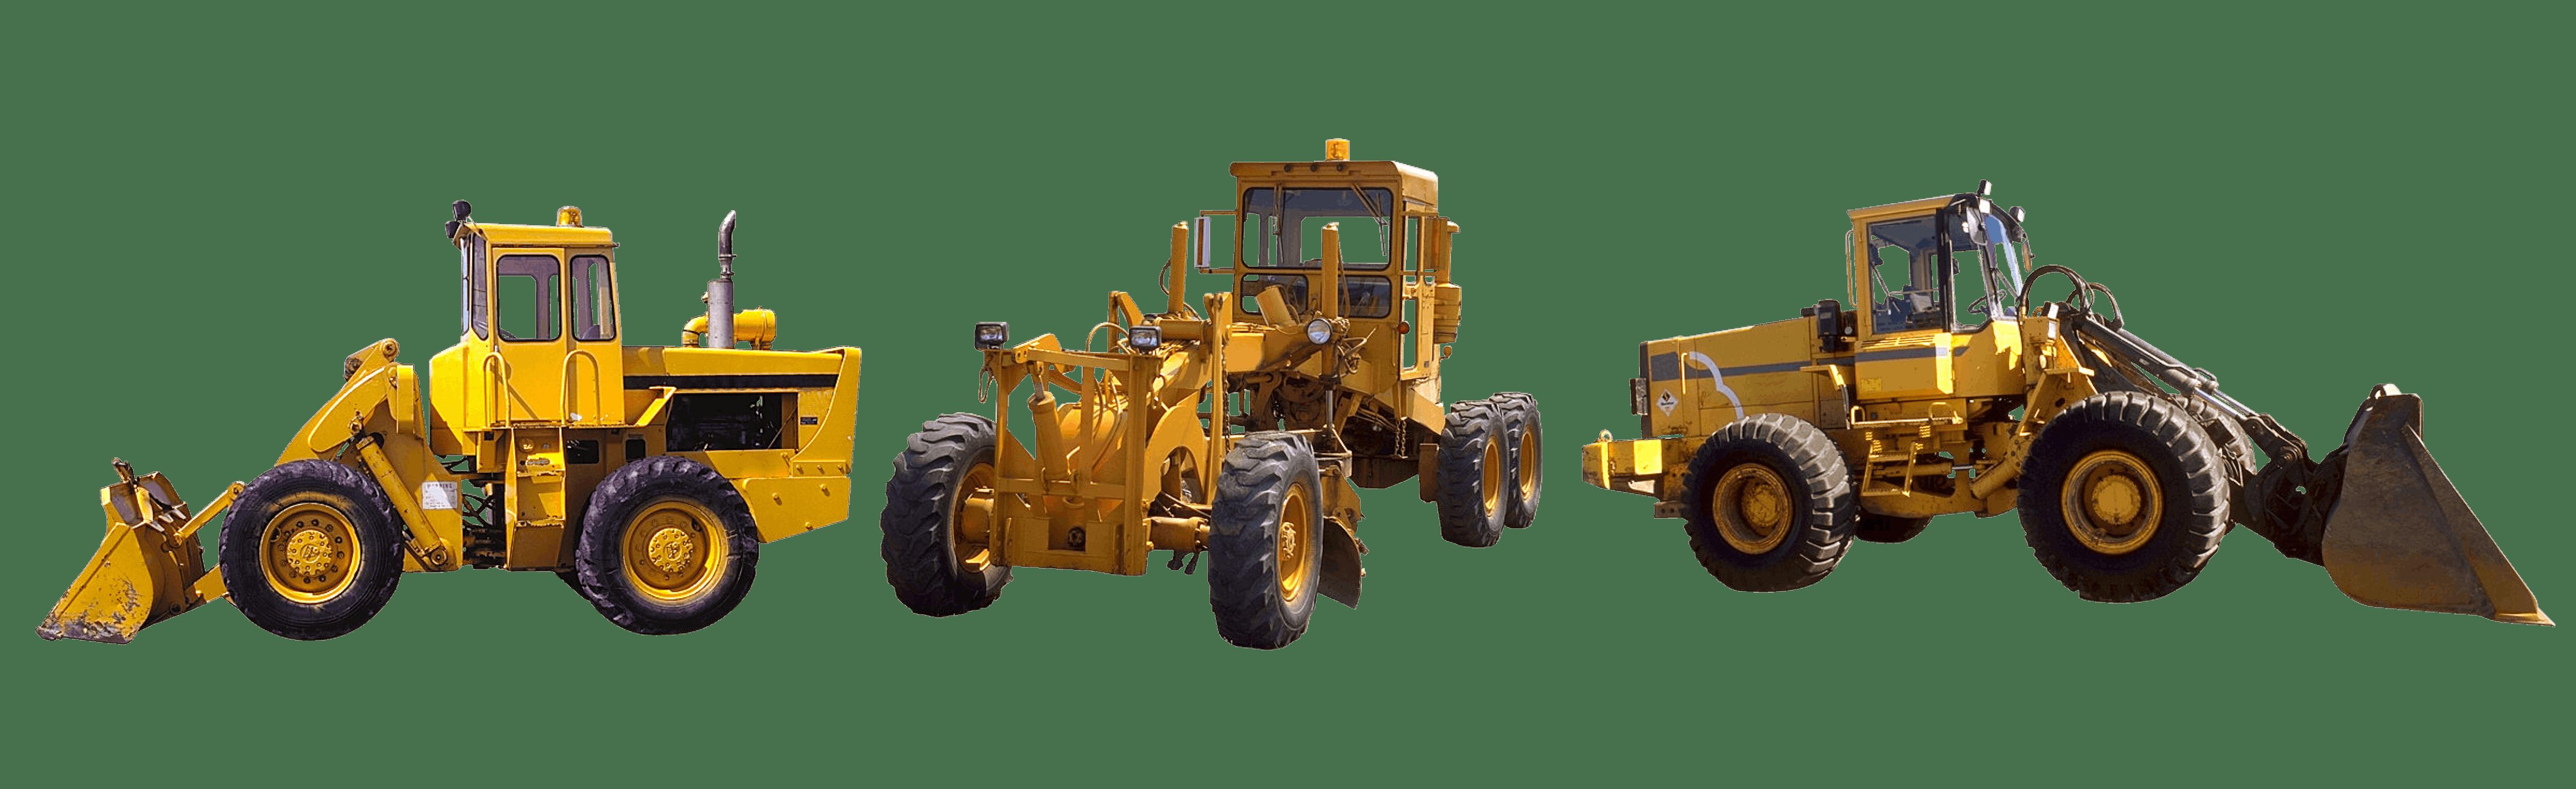 Free stock photo of construction, tractor, wheels, bucket